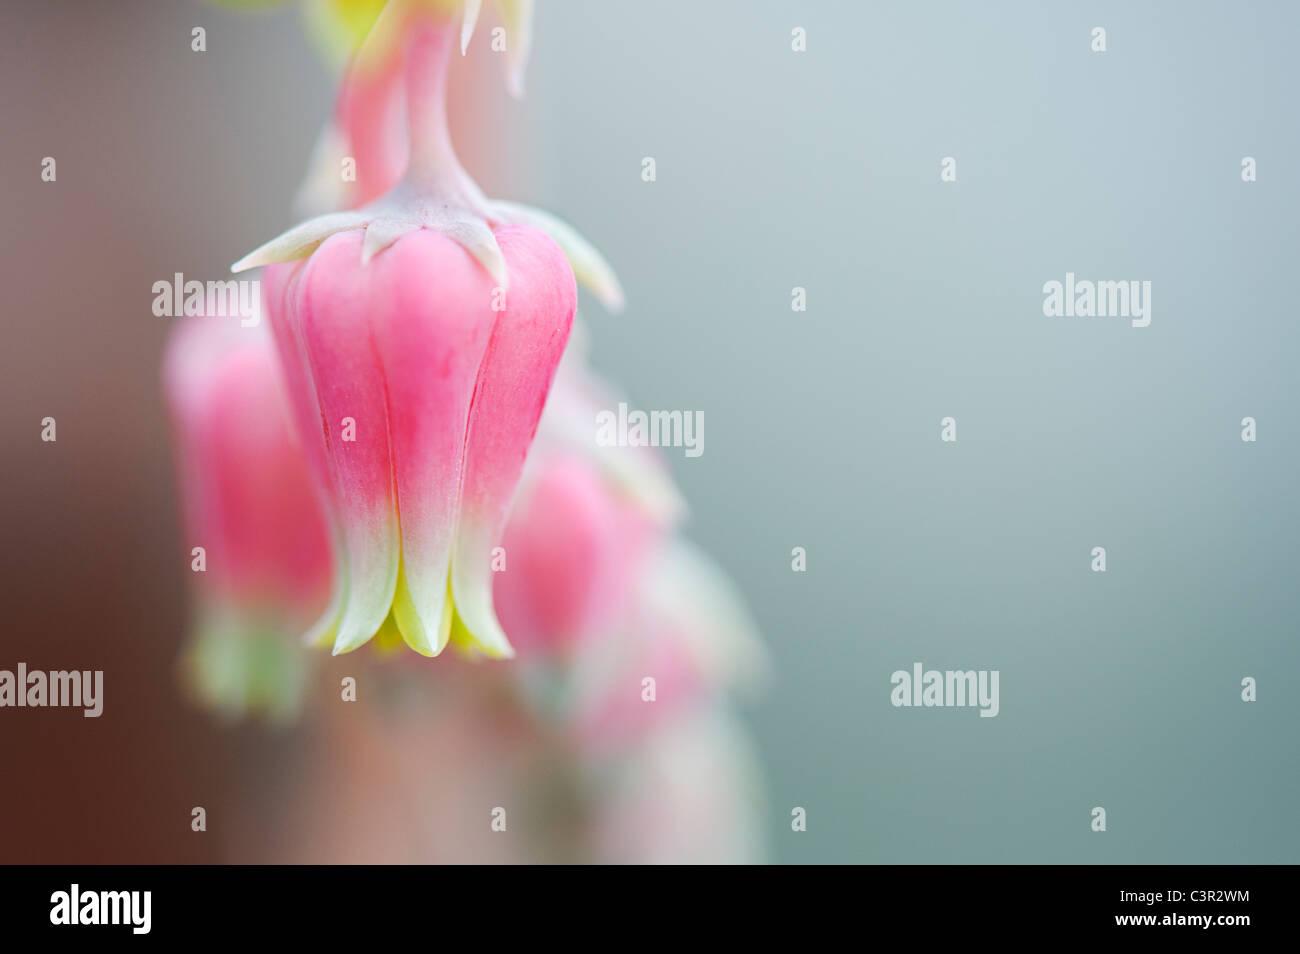 Echeveria sanchez mejoradae flowers - Stock Image